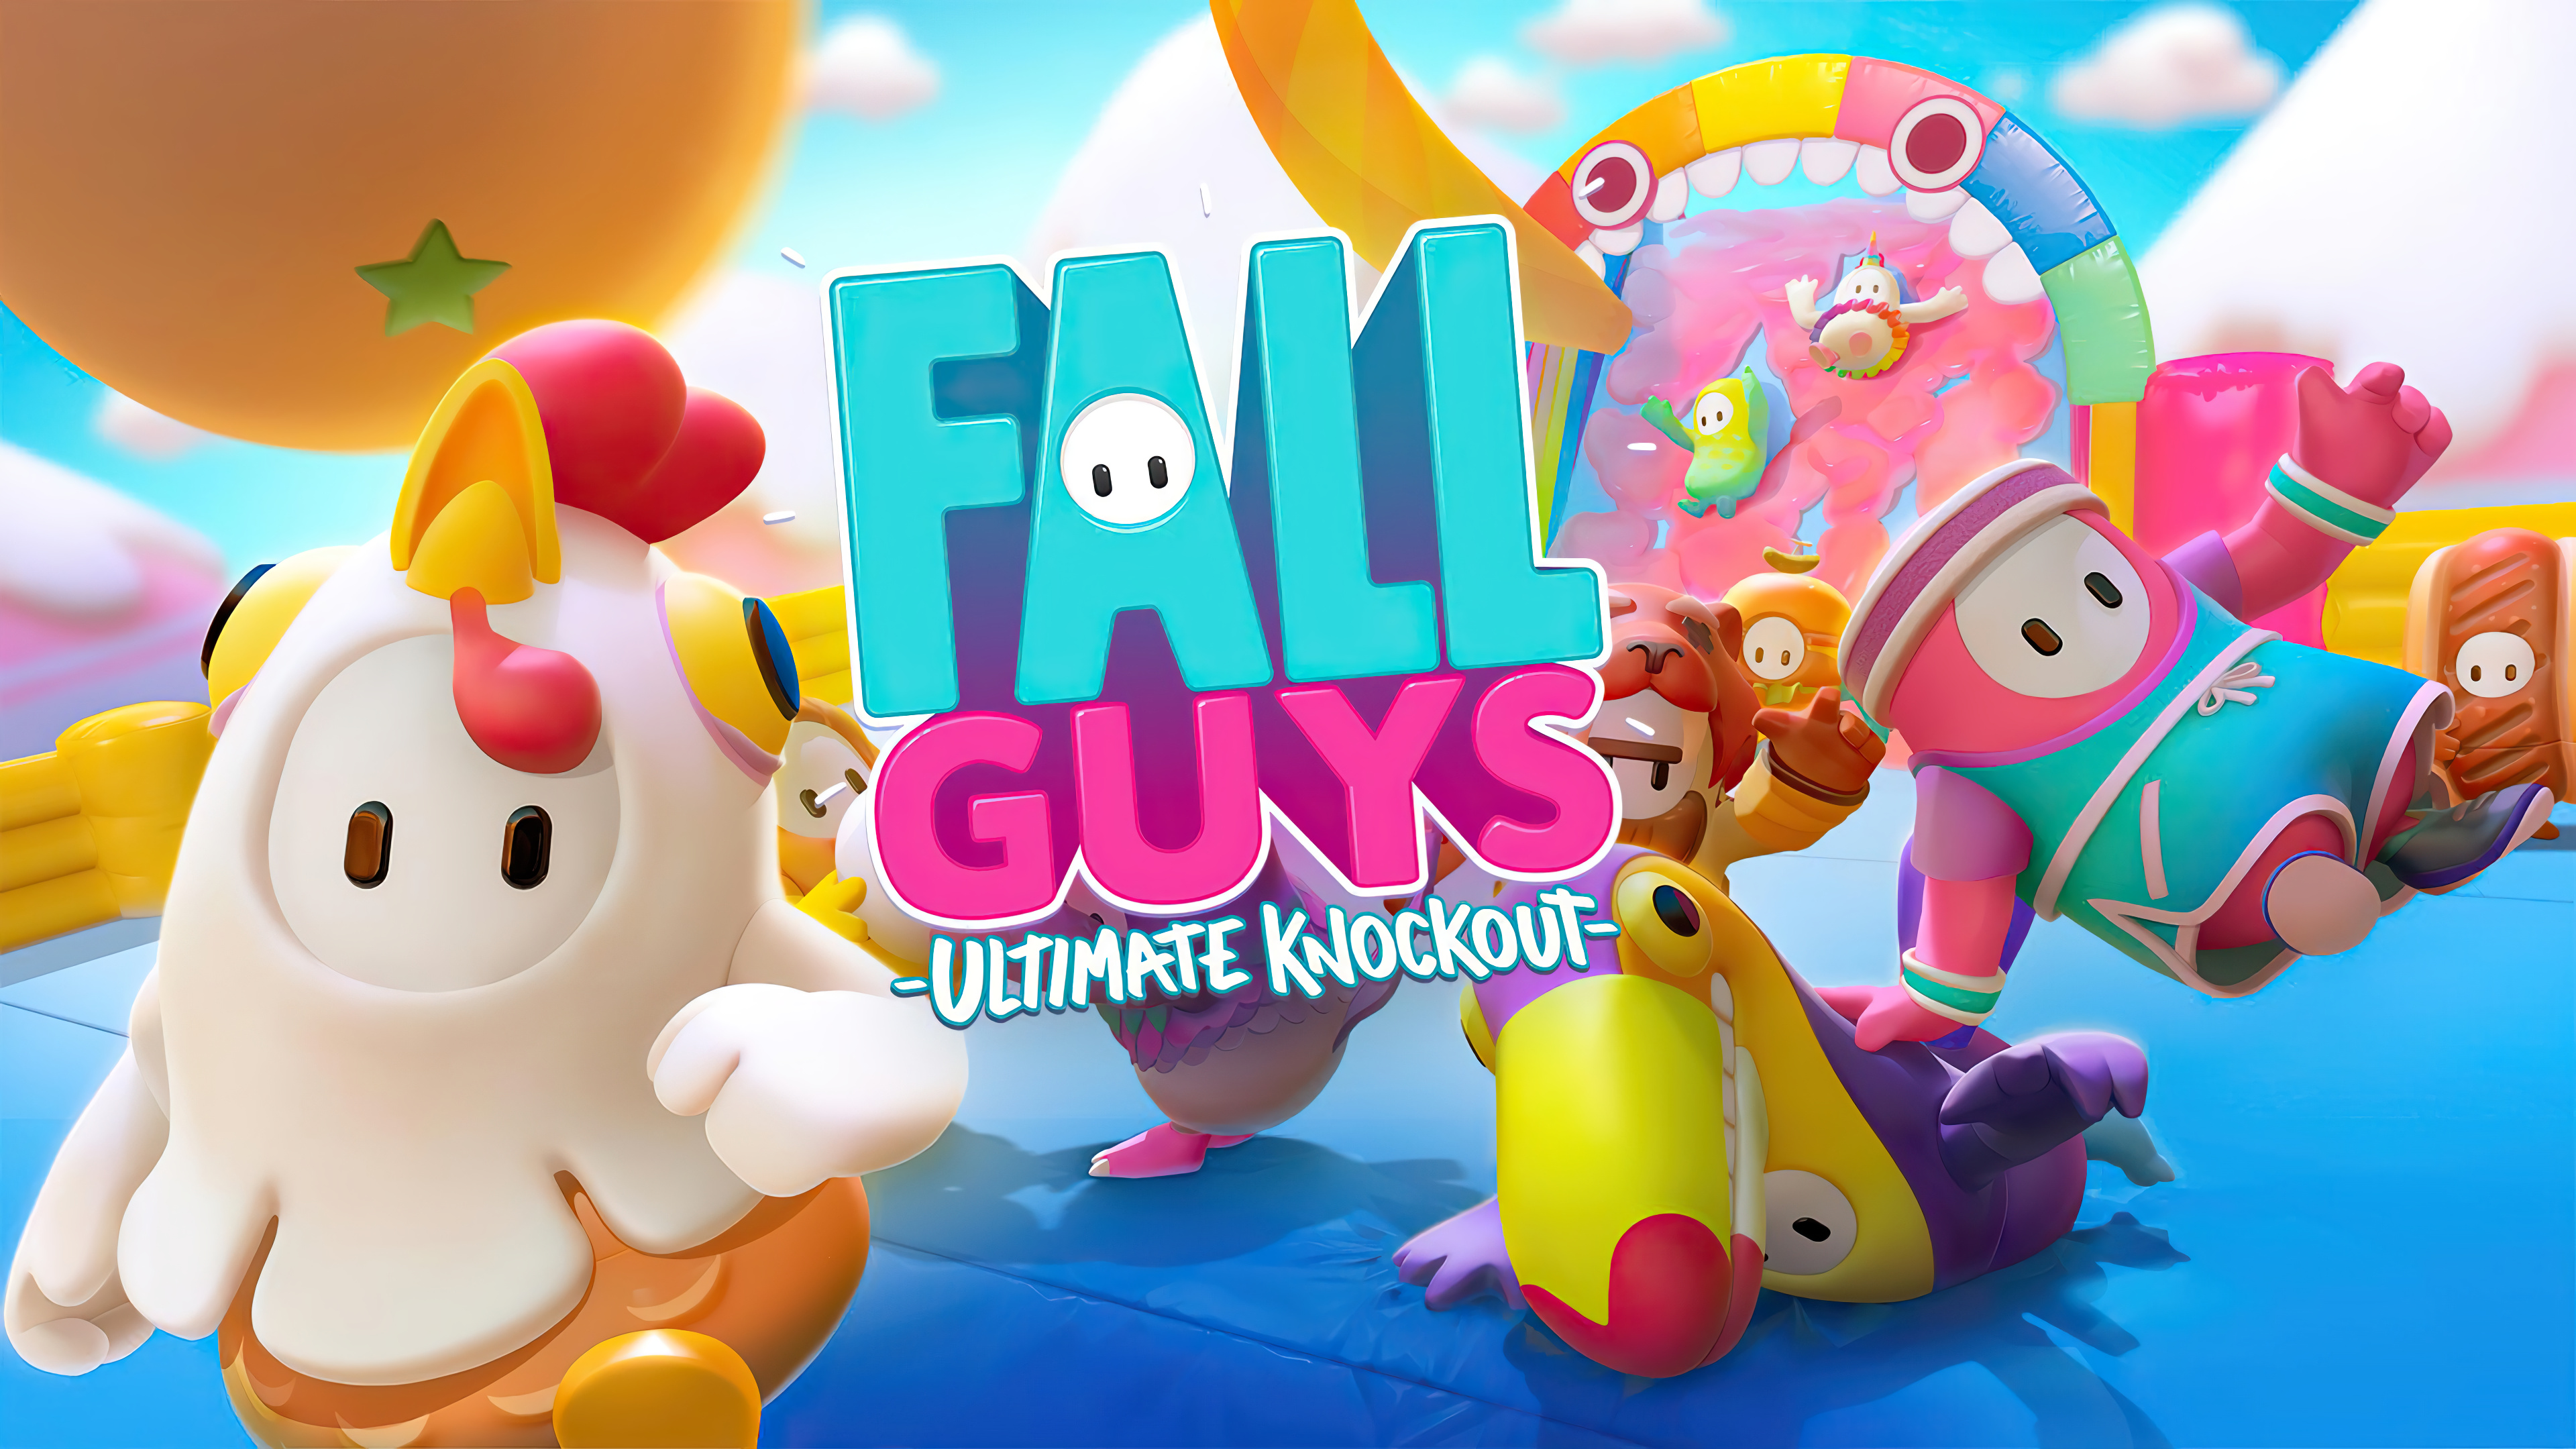 Fondos de pantalla Fall Guys Ultimate Knockout